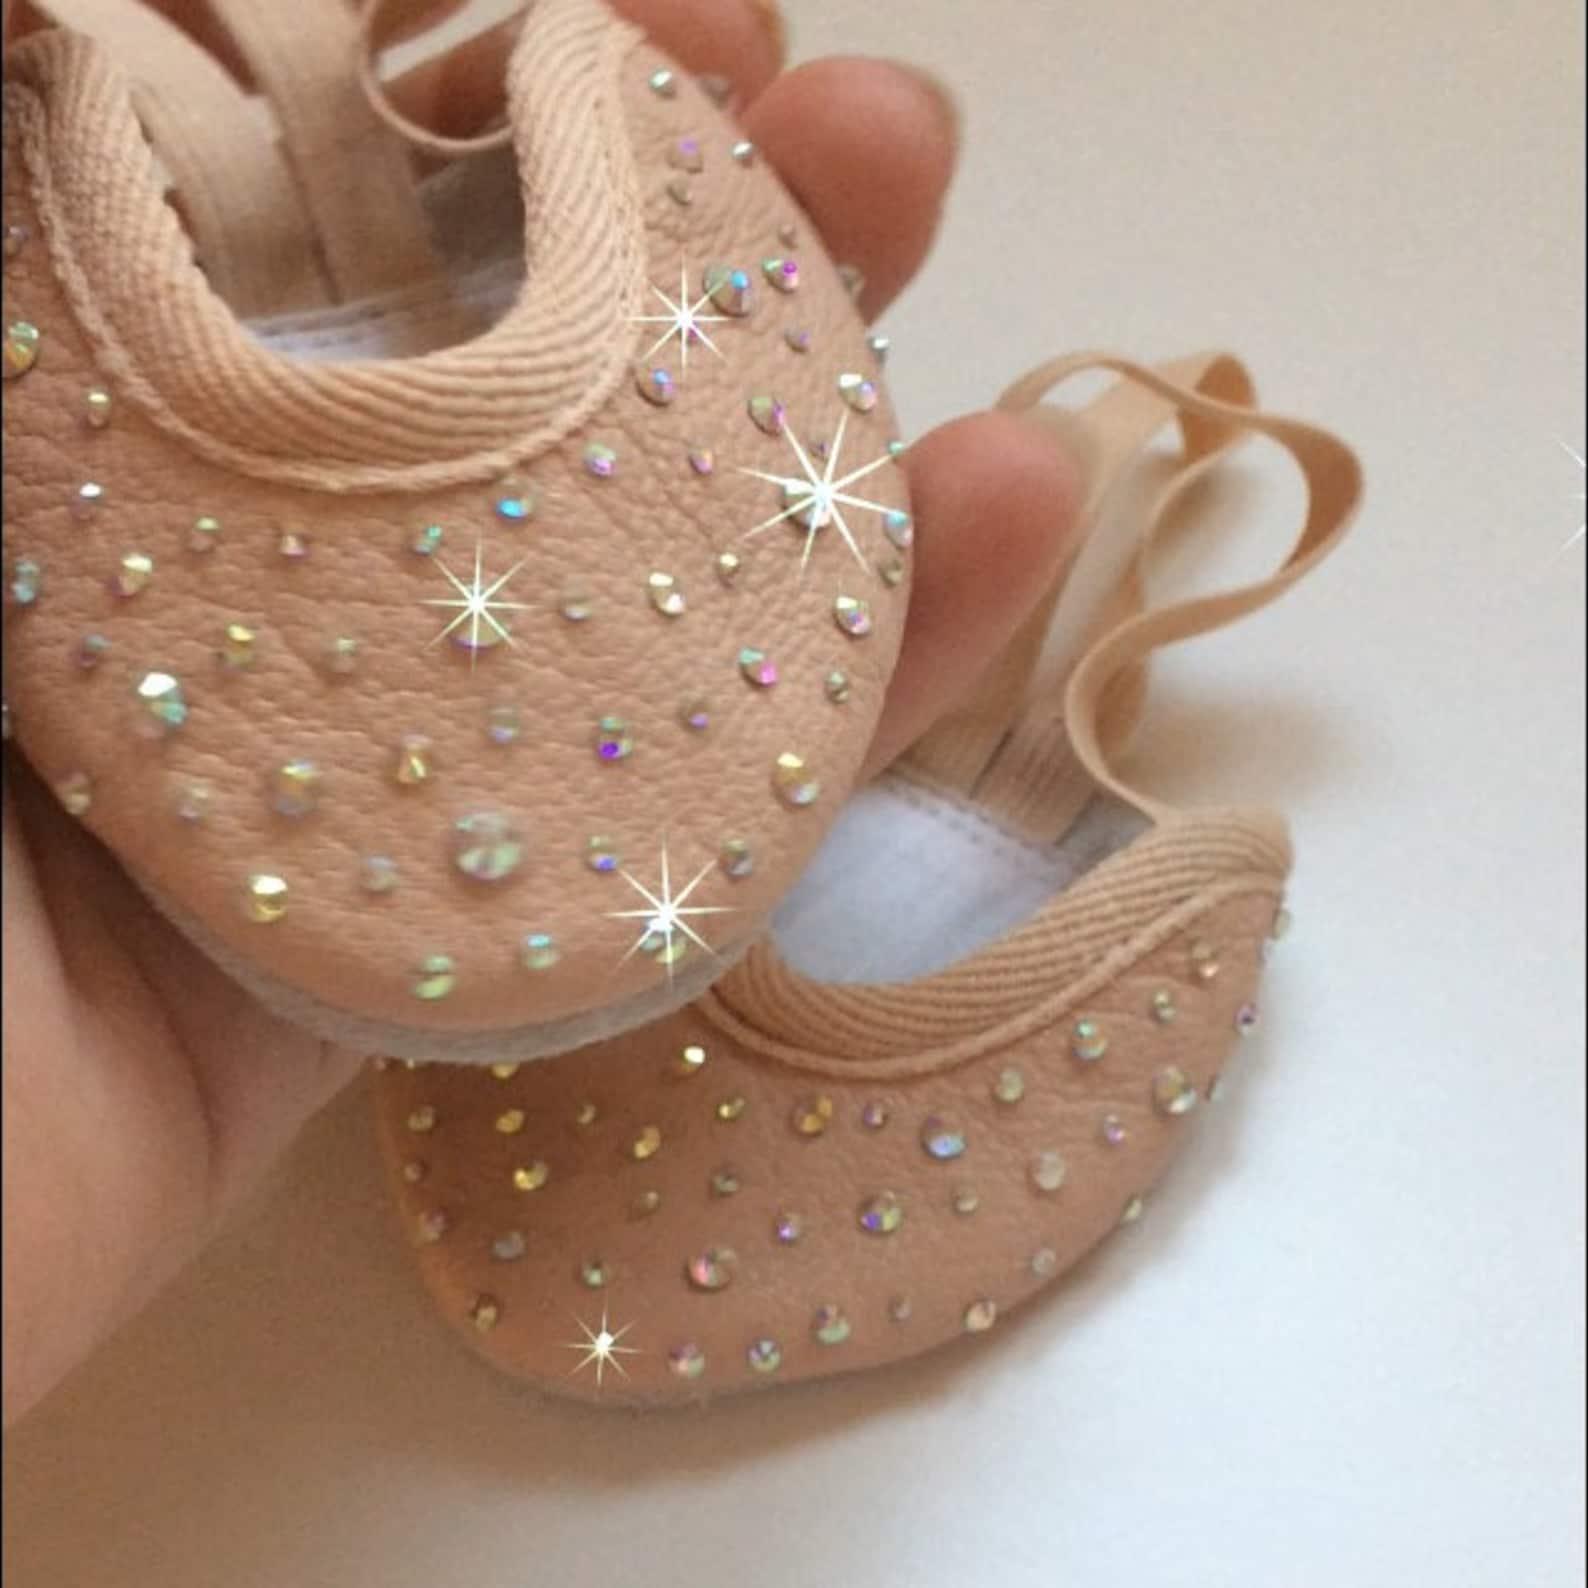 diamante toe shoes half shoes ballet rhythmic gymnastics lyrical dance all sizes